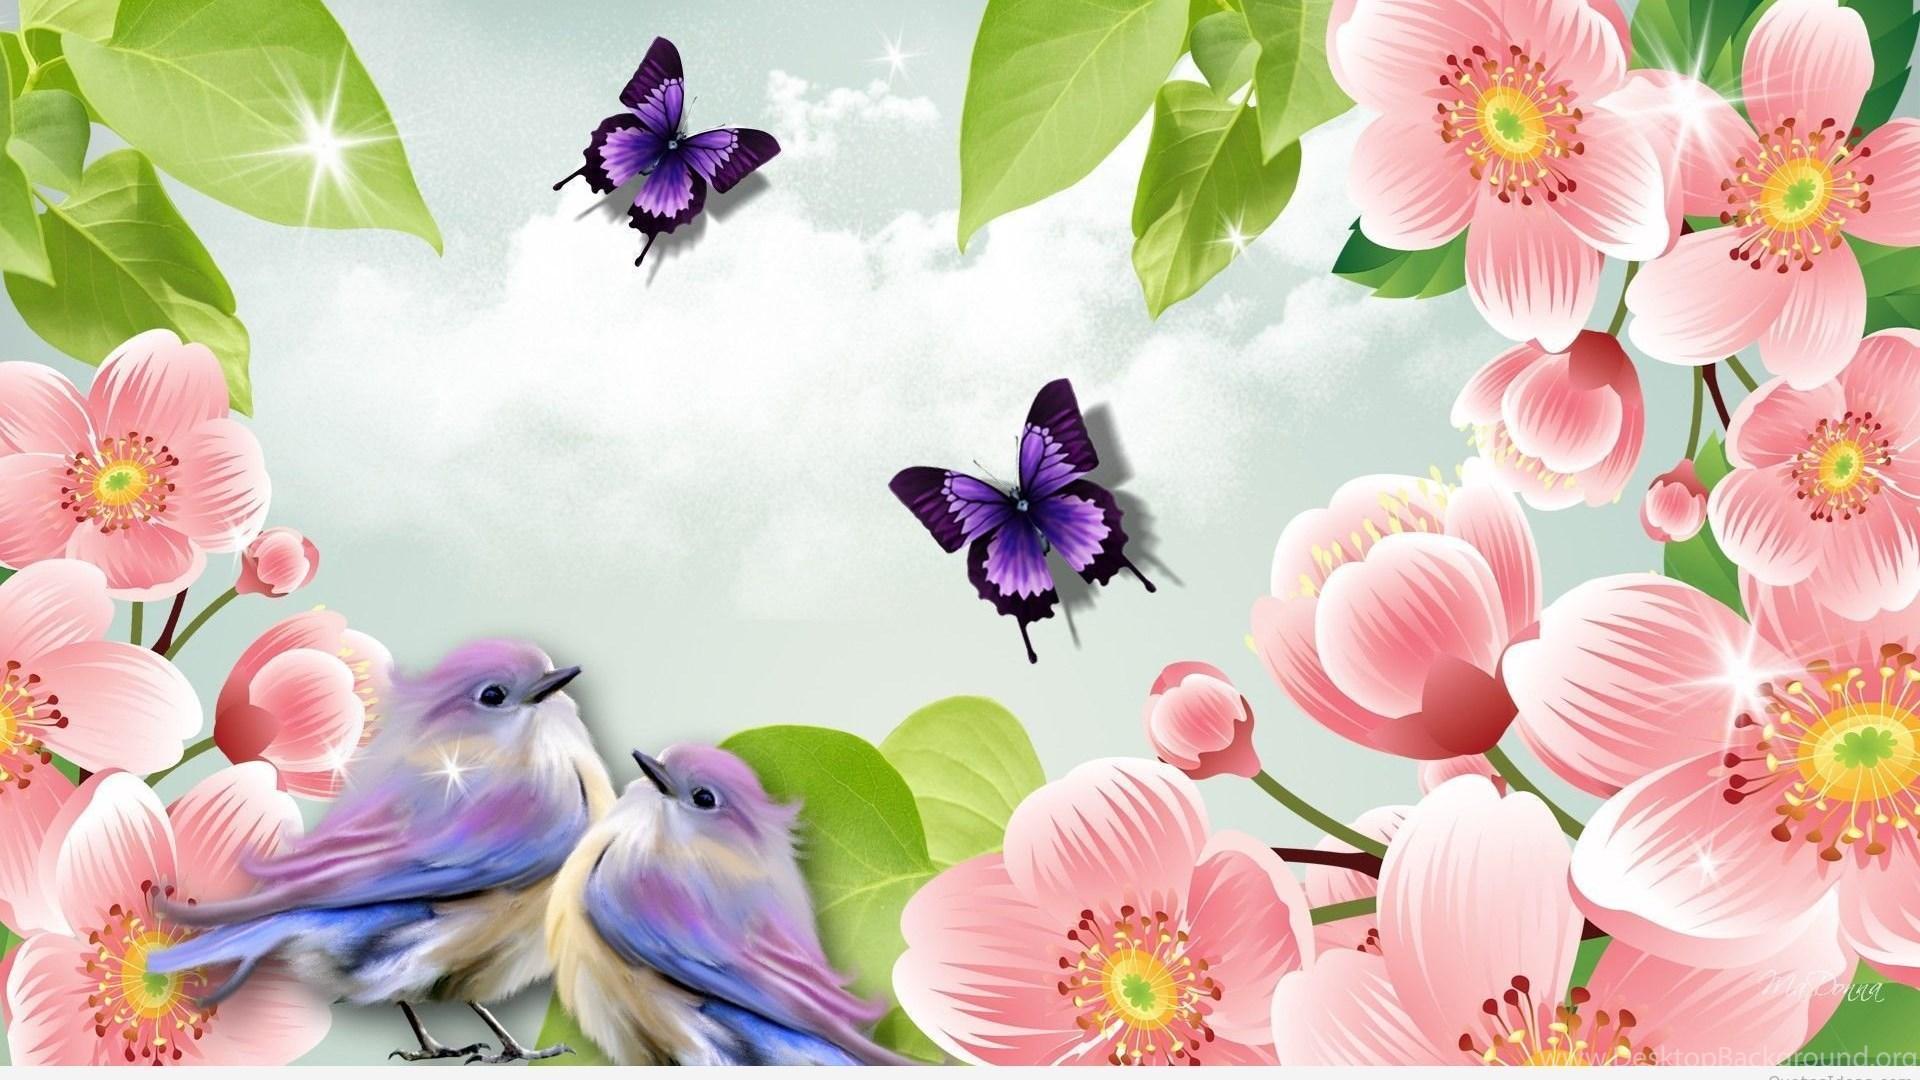 Wallpapers March Spring Desktop Background